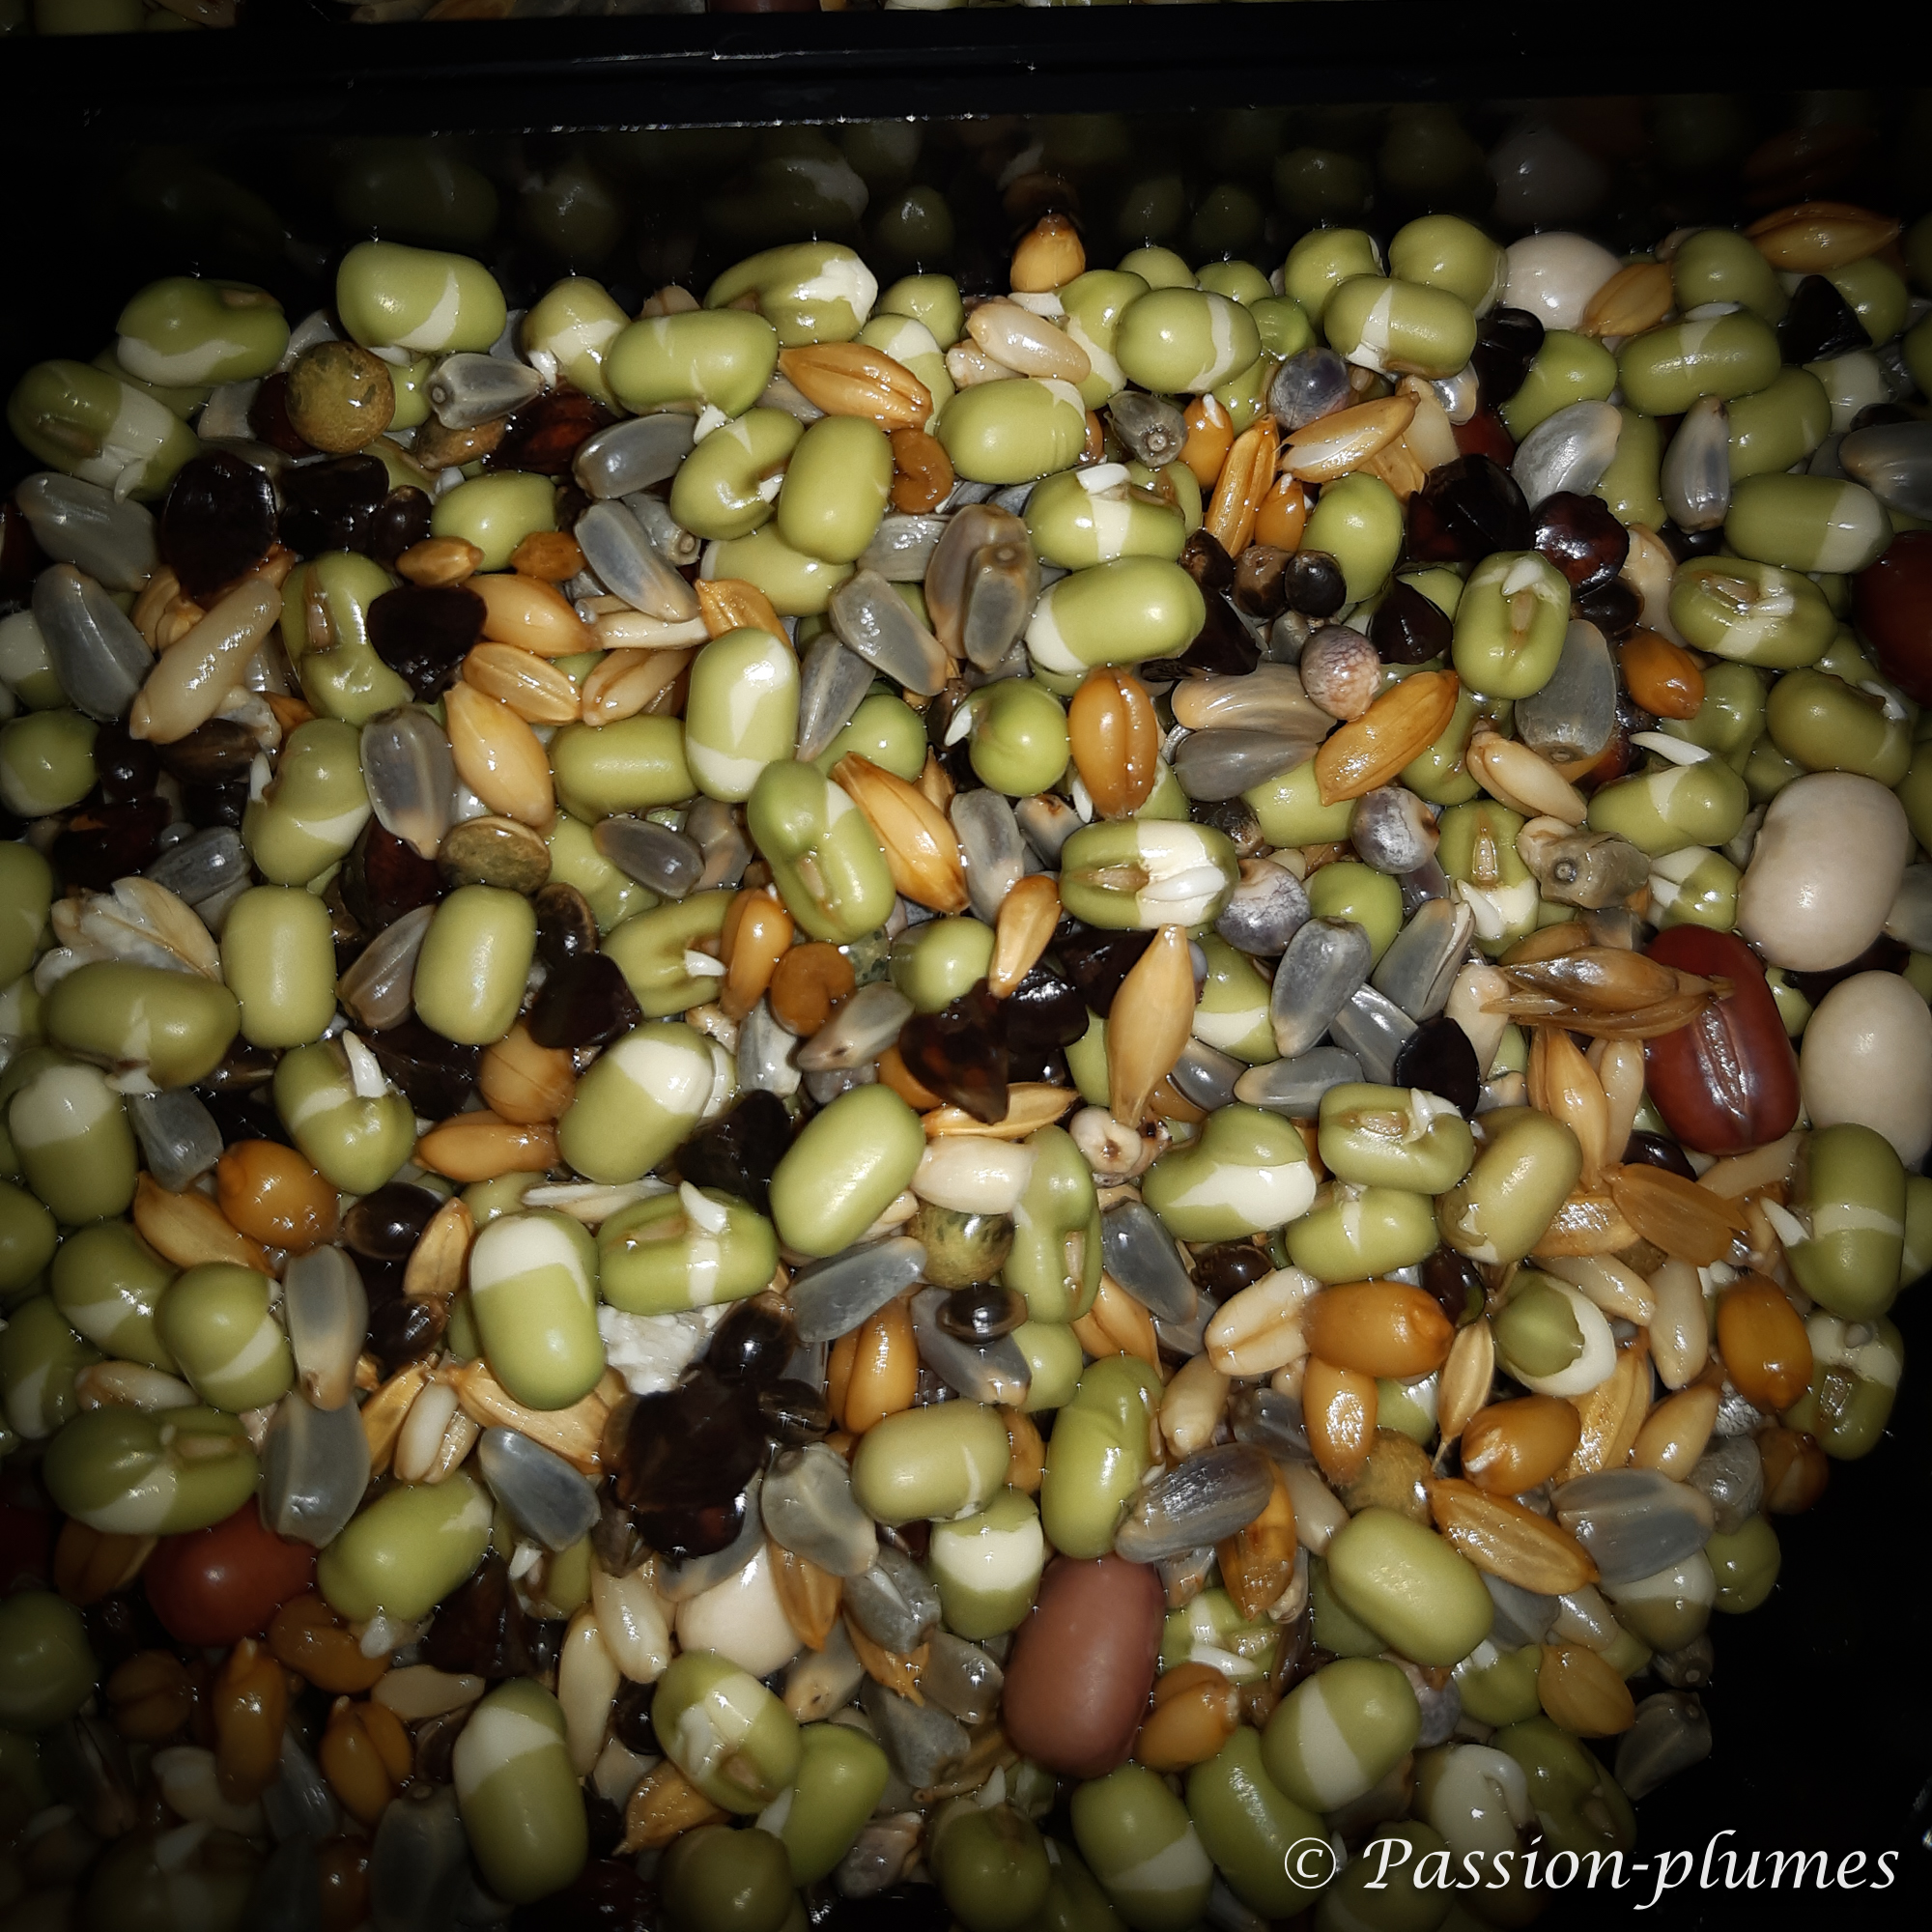 graines germées perruches